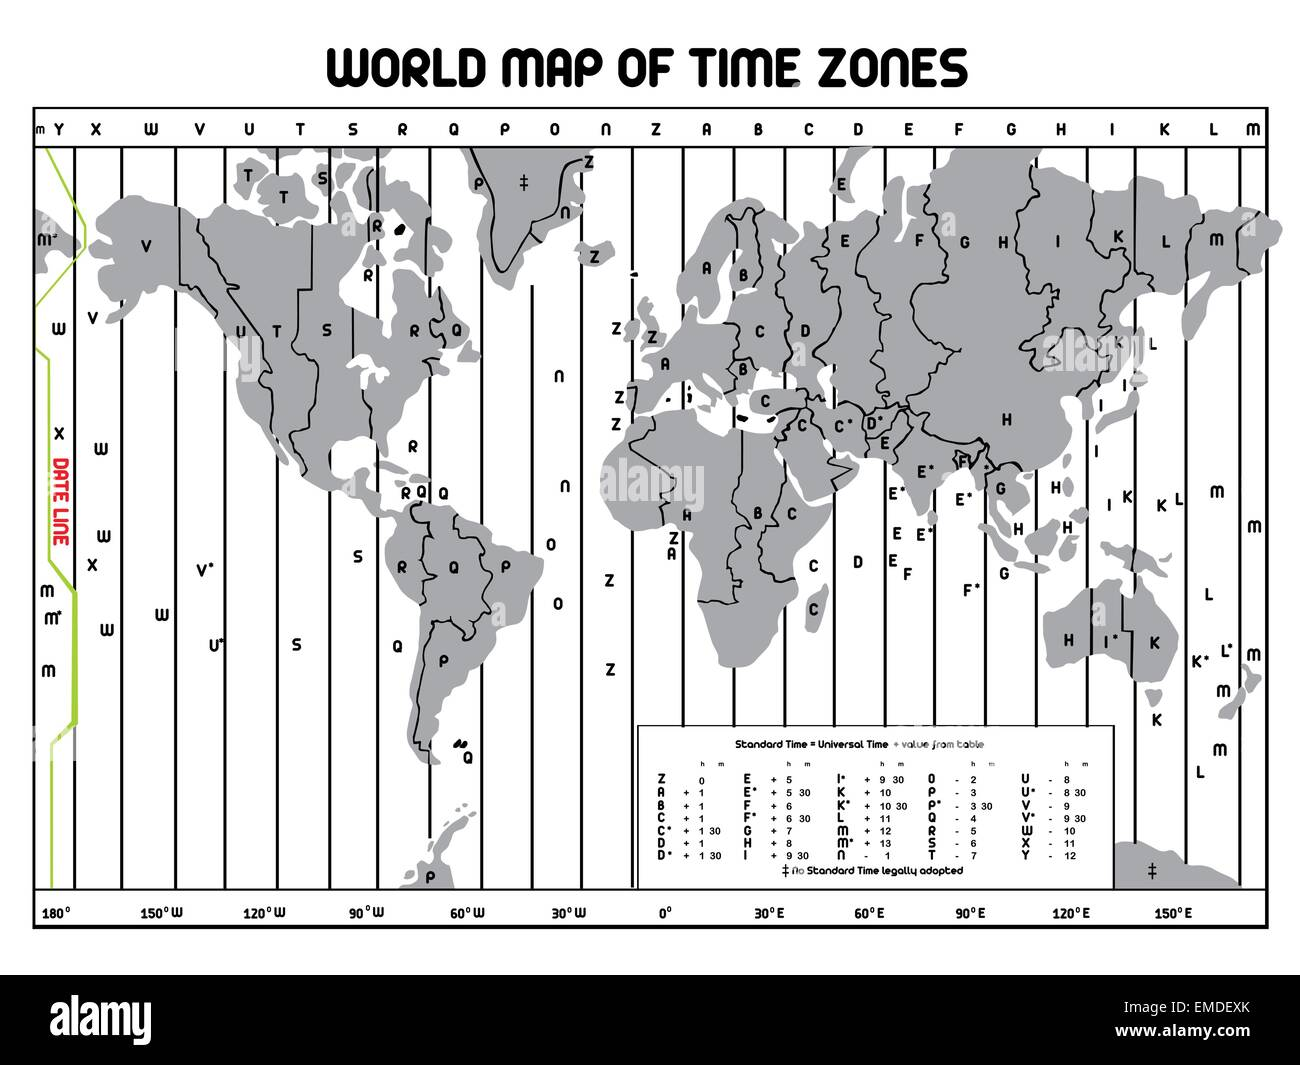 Cartina Fusi Orari Mondo.Timezone Map Immagini E Fotos Stock Alamy